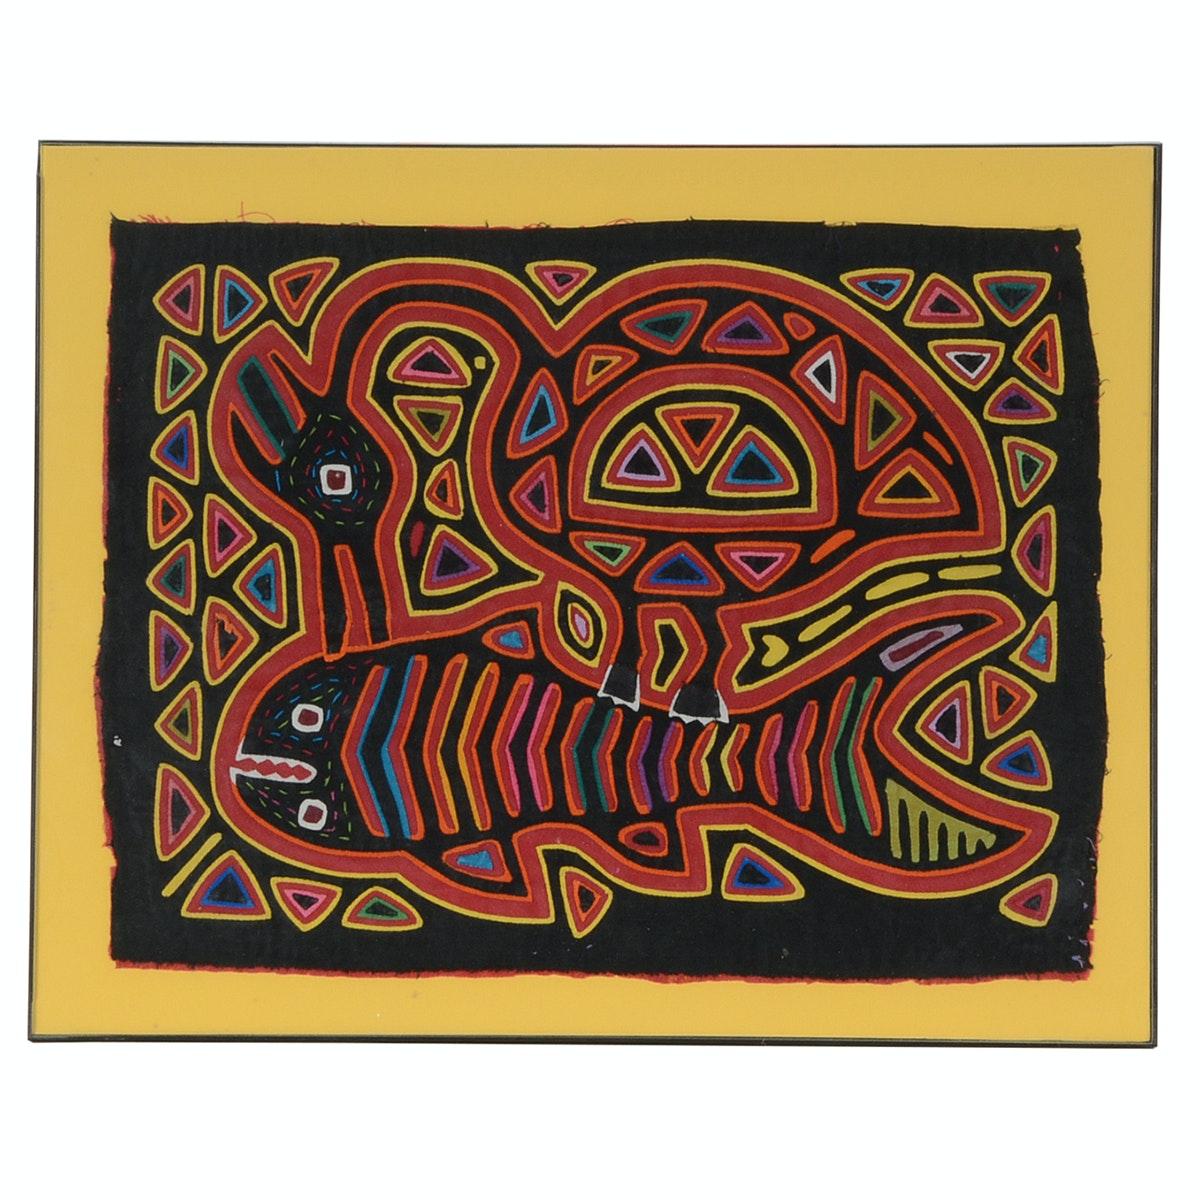 South American Hand-Stitched Folk Art Animal Textile